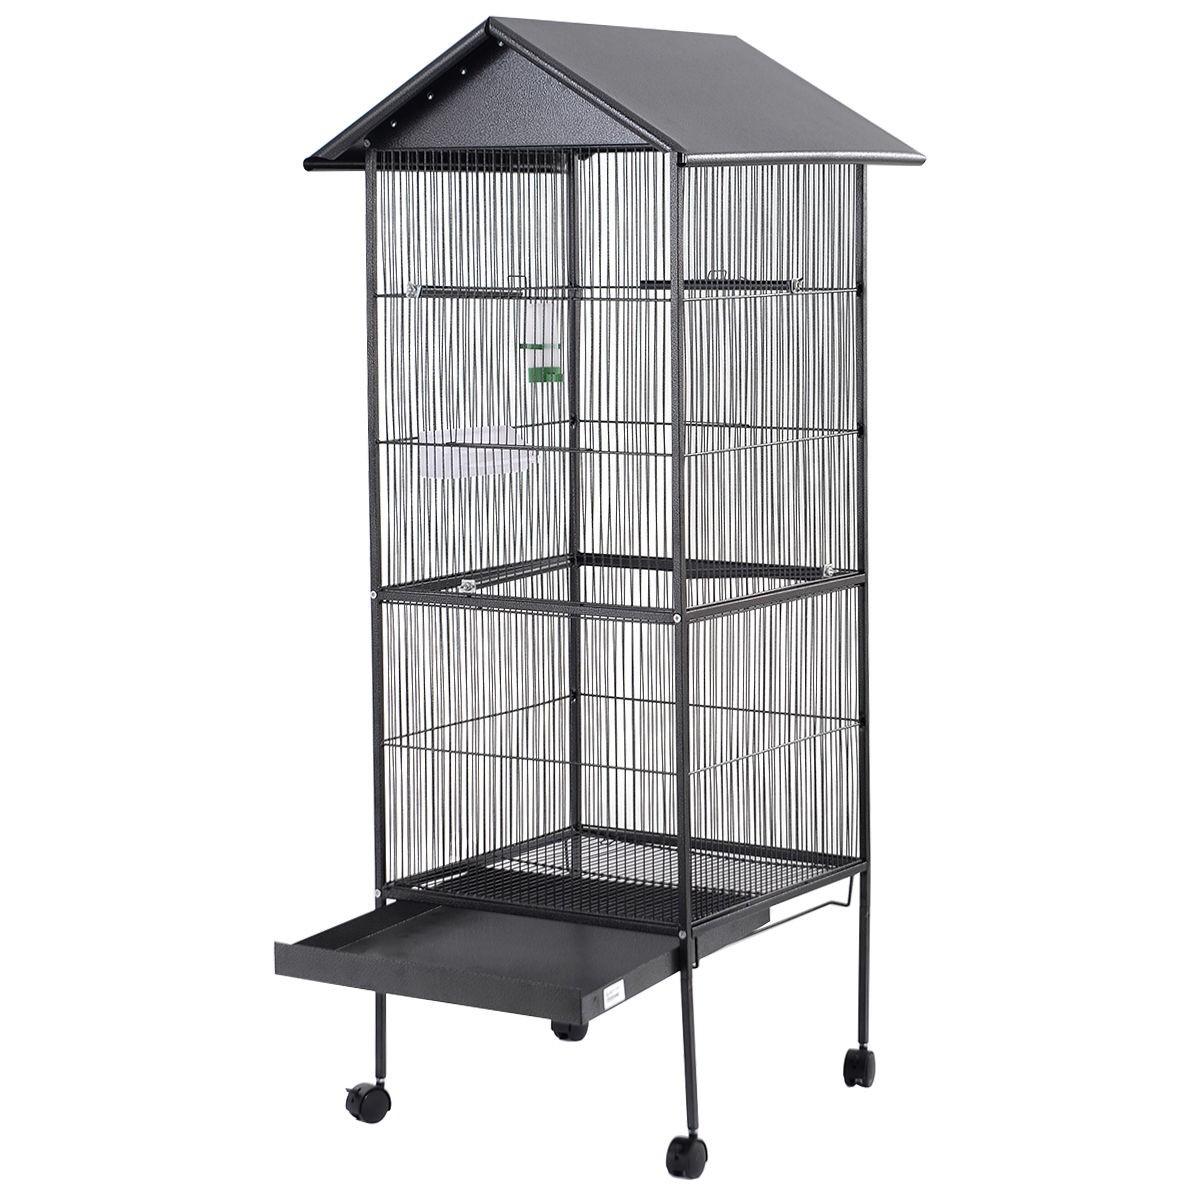 parrot canary pet bird cage black cockatiel parakeet finch crate feeder perch ebay. Black Bedroom Furniture Sets. Home Design Ideas